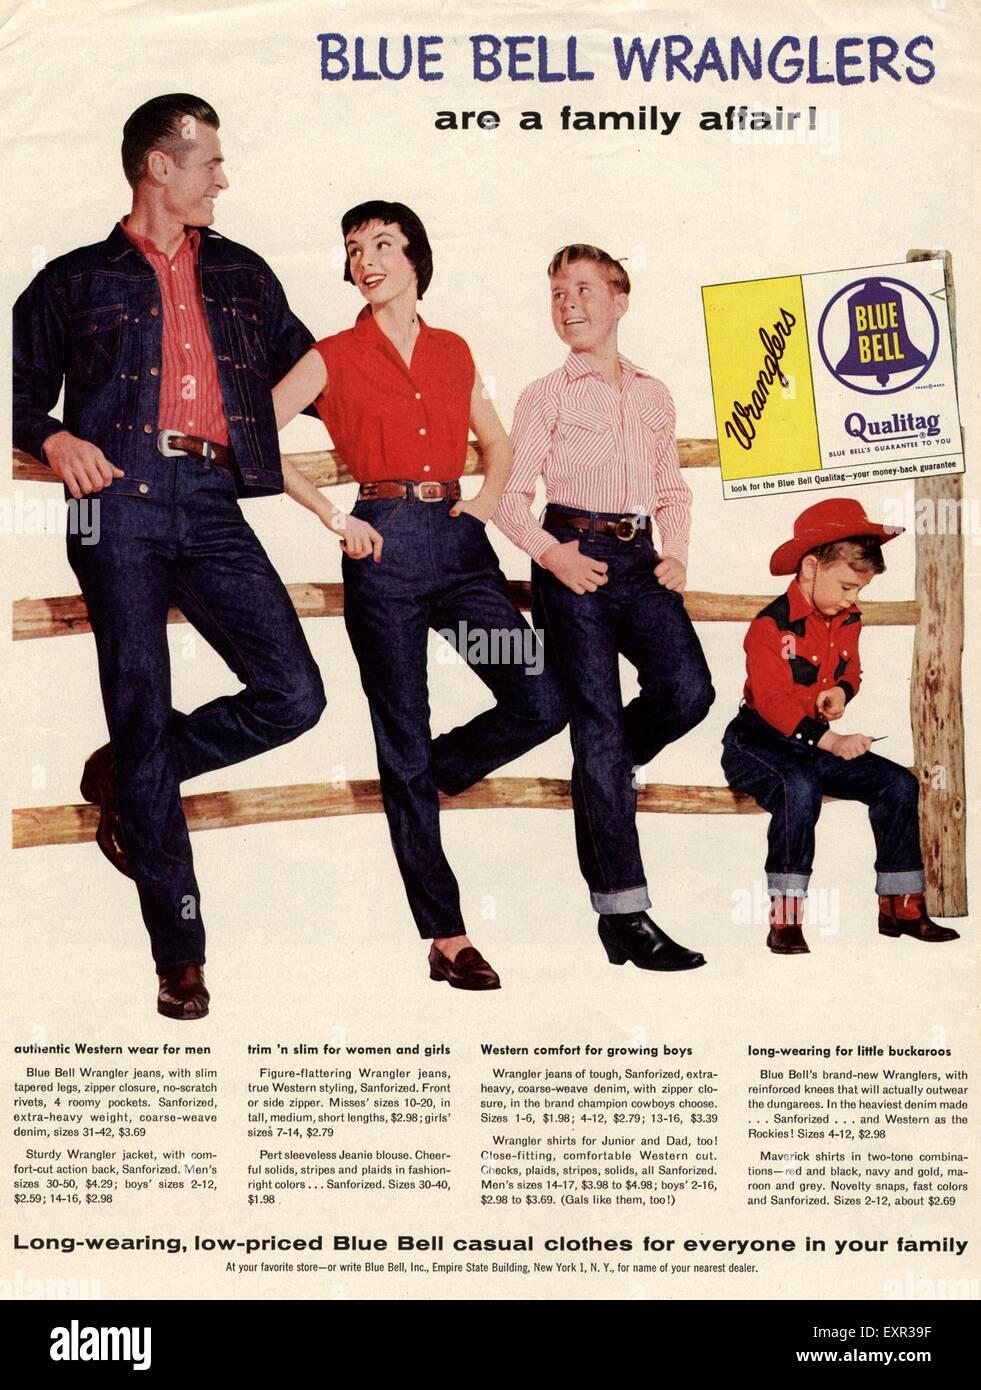 37f7f768a 1950s USA Wrangler Magazine Advert Stock Photo: 85330043 - Alamy